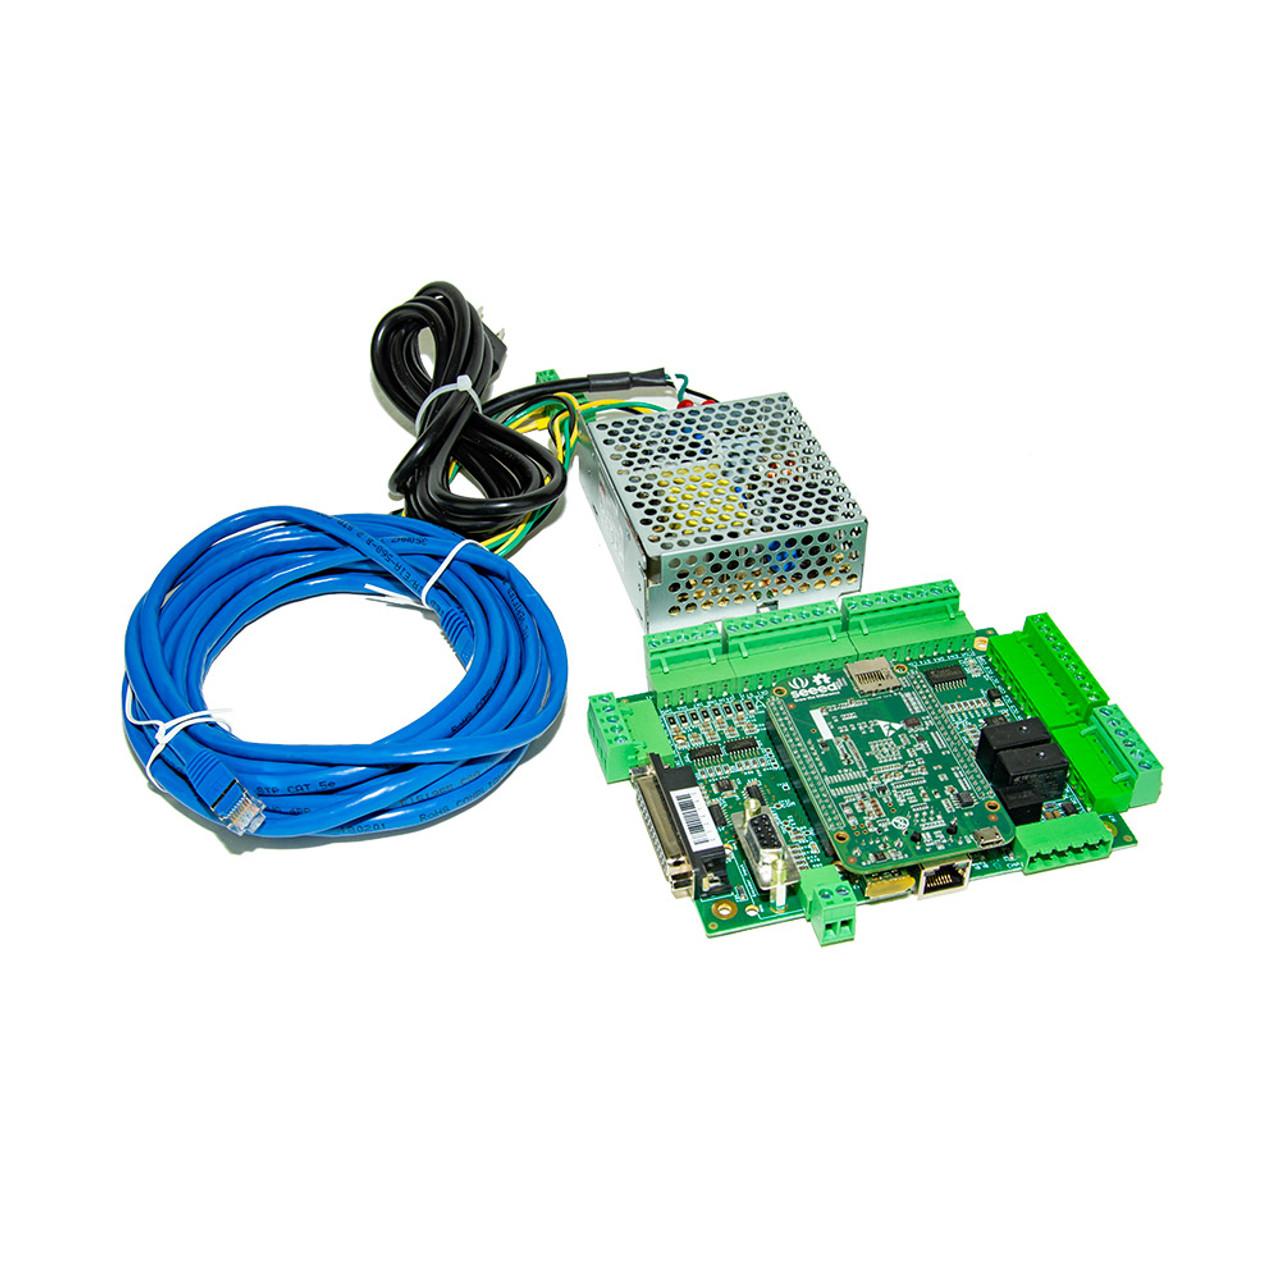 Centroid DIY Acorn CNC Controller Kit